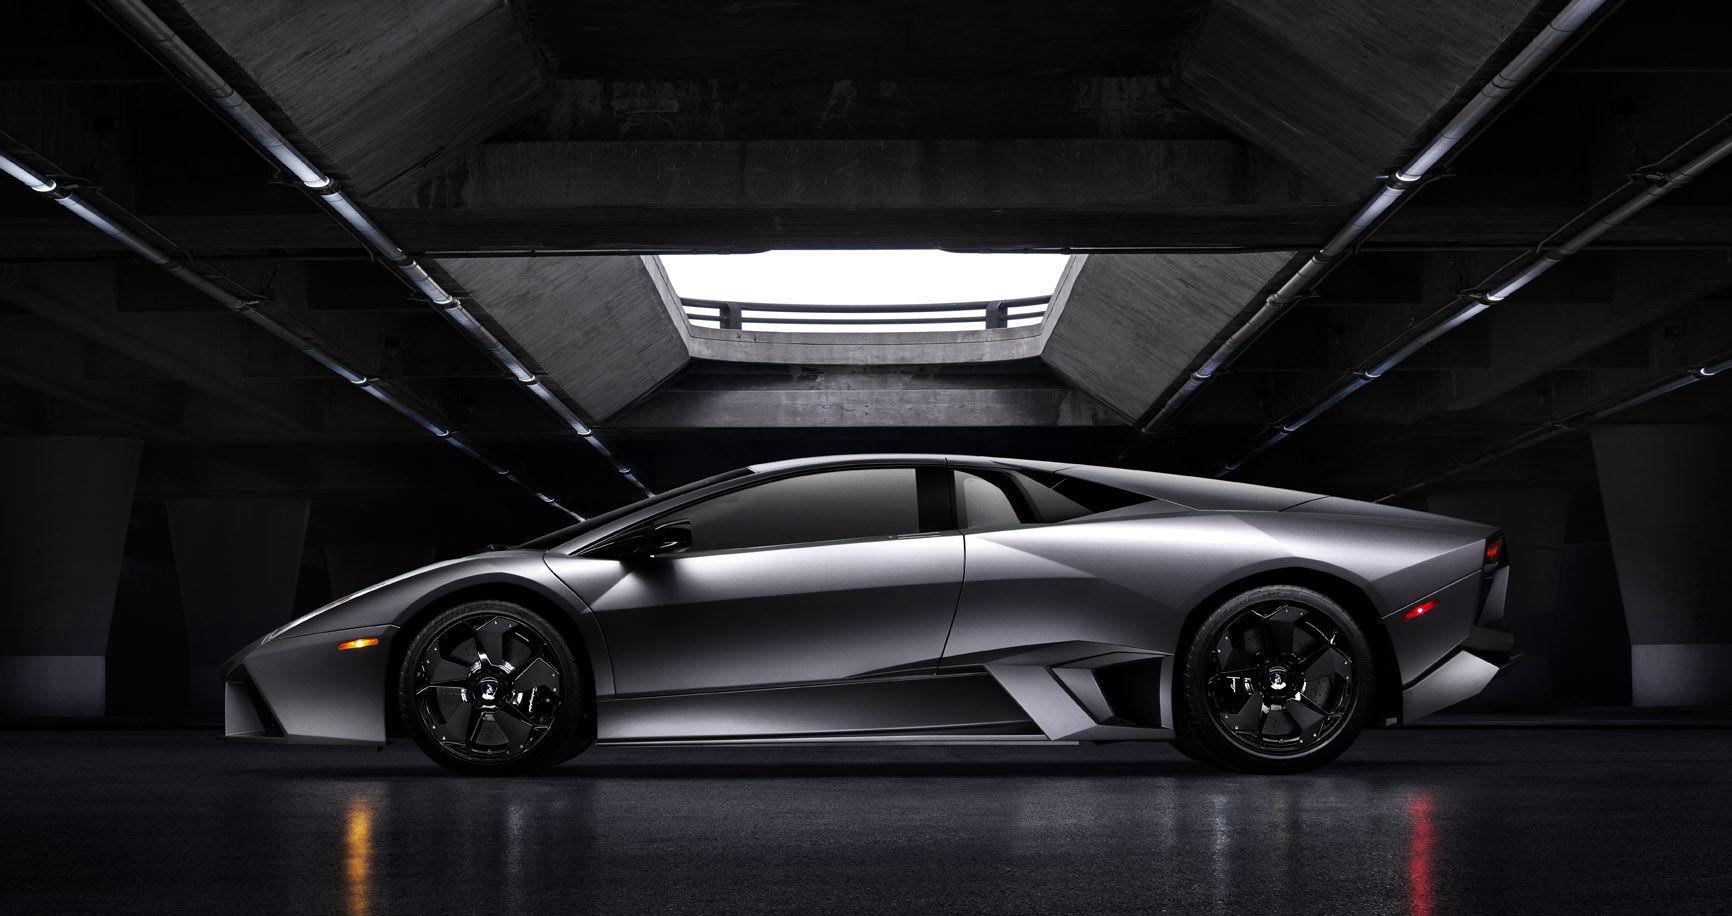 2008 Lamborghini Reventon | 2008 Lamborghini Reventon